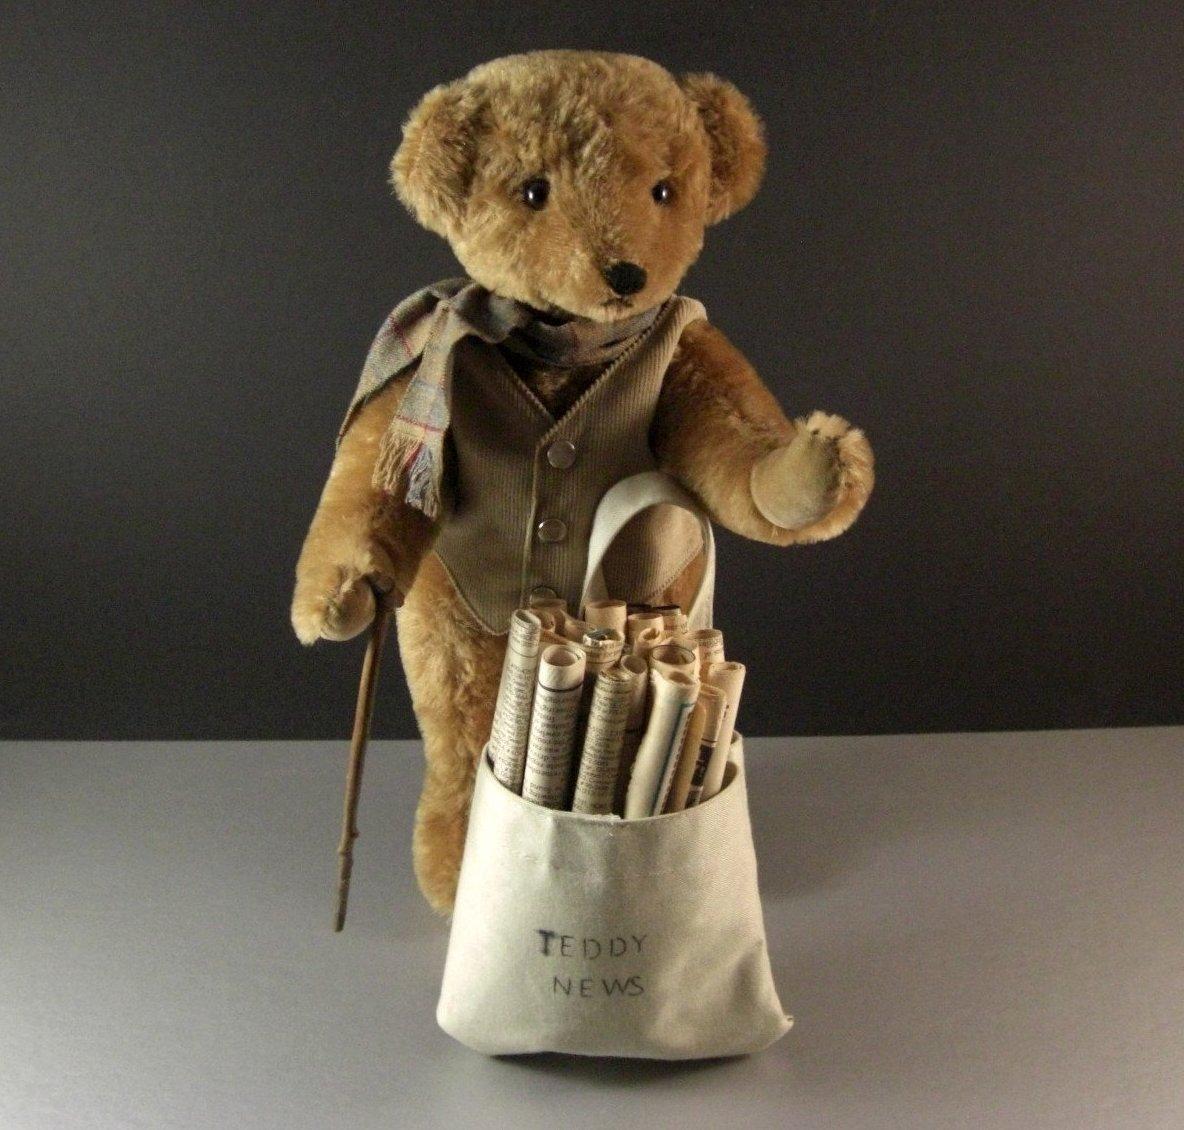 Teddy News Bear by artist Joanne C. Mitchell / signed